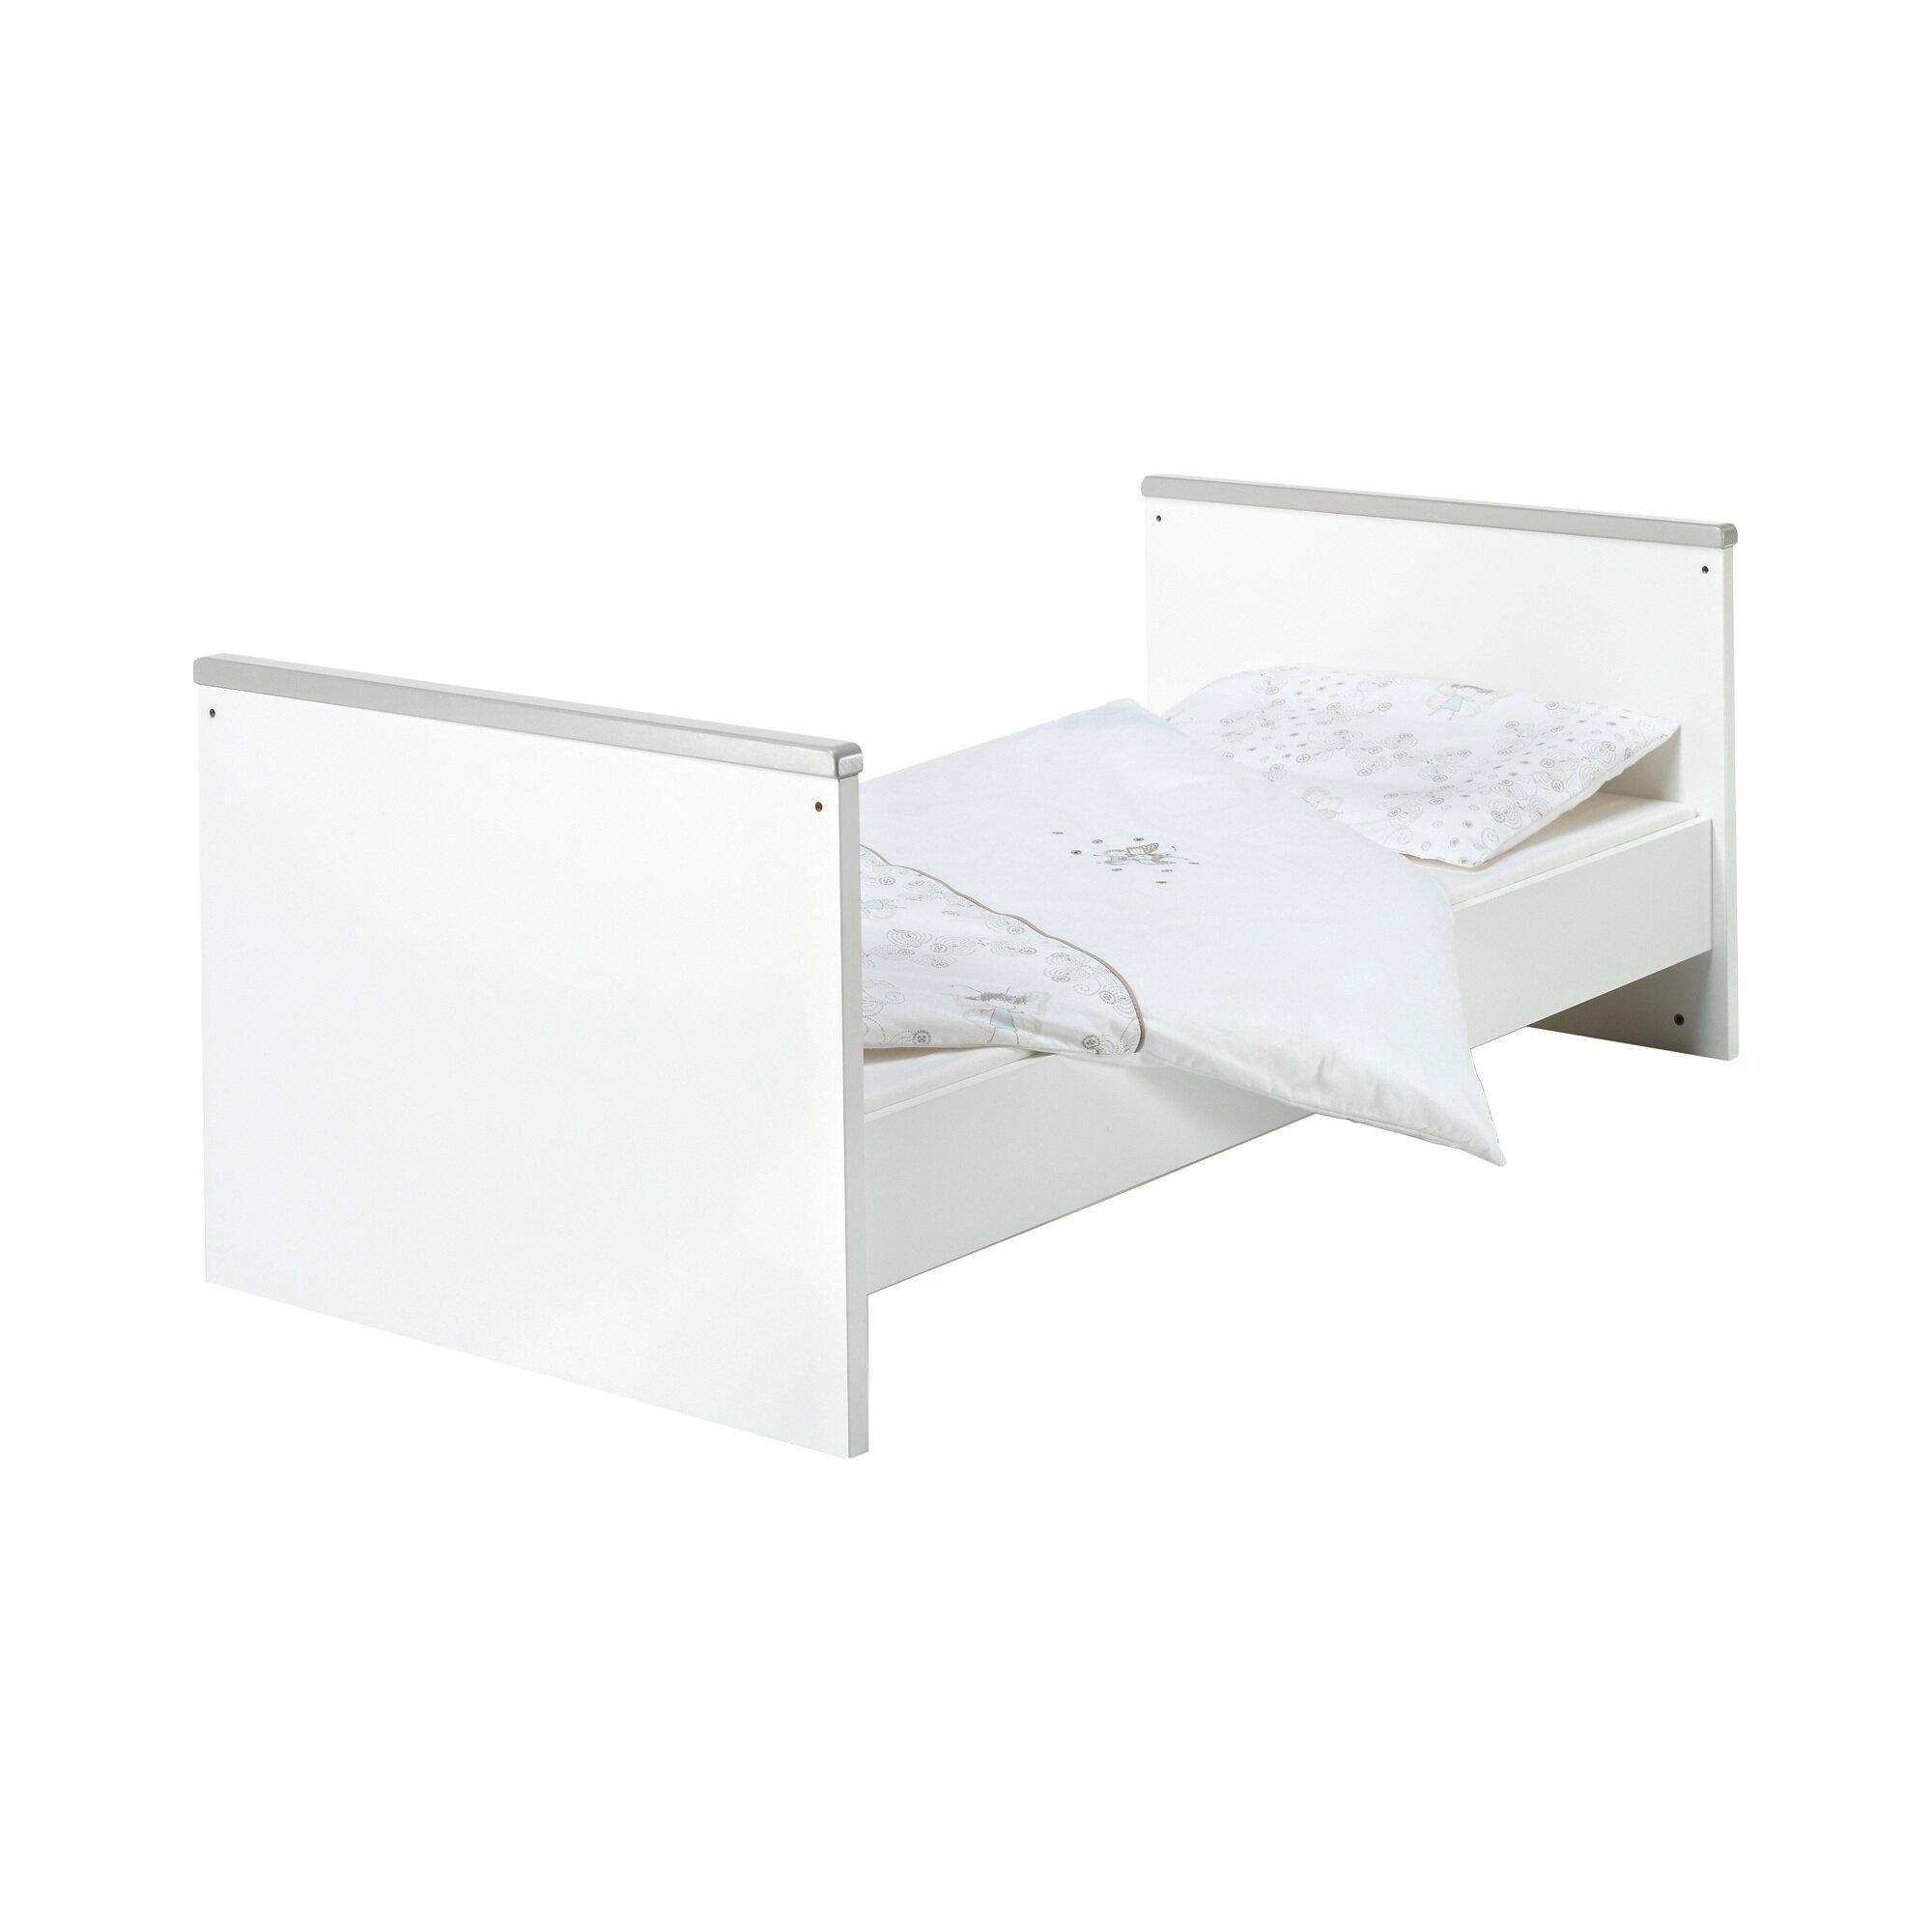 schardt-babybett-eco-silber-70x140-cm